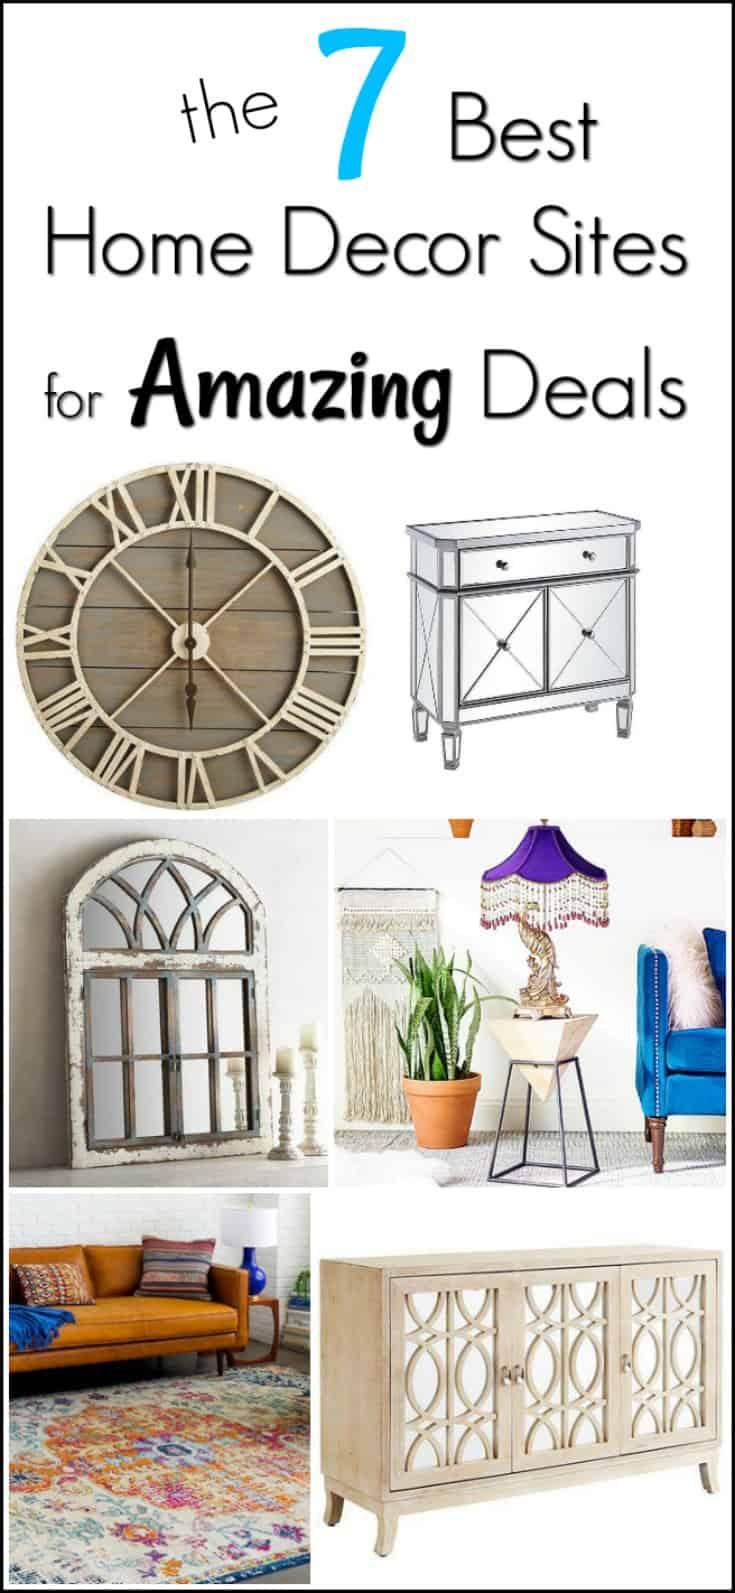 The 7 Best Home Decor Sites For Amazing Deals For A Home Decorators Catalog Best Ideas of Home Decor and Design [homedecoratorscatalog.us]